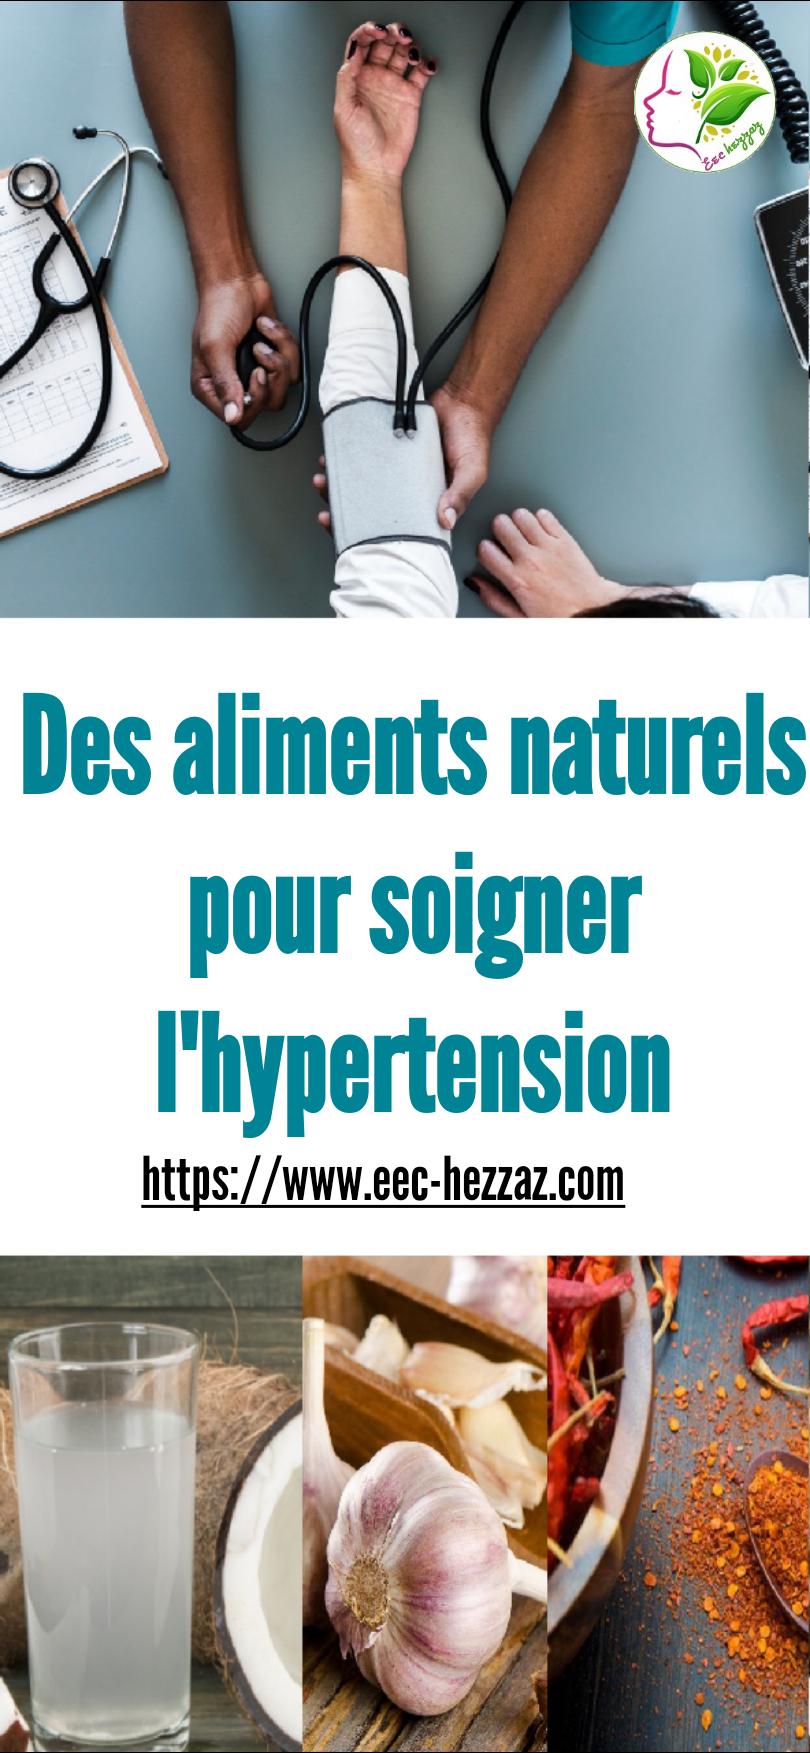 Des aliments naturels pour soigner l'hypertension